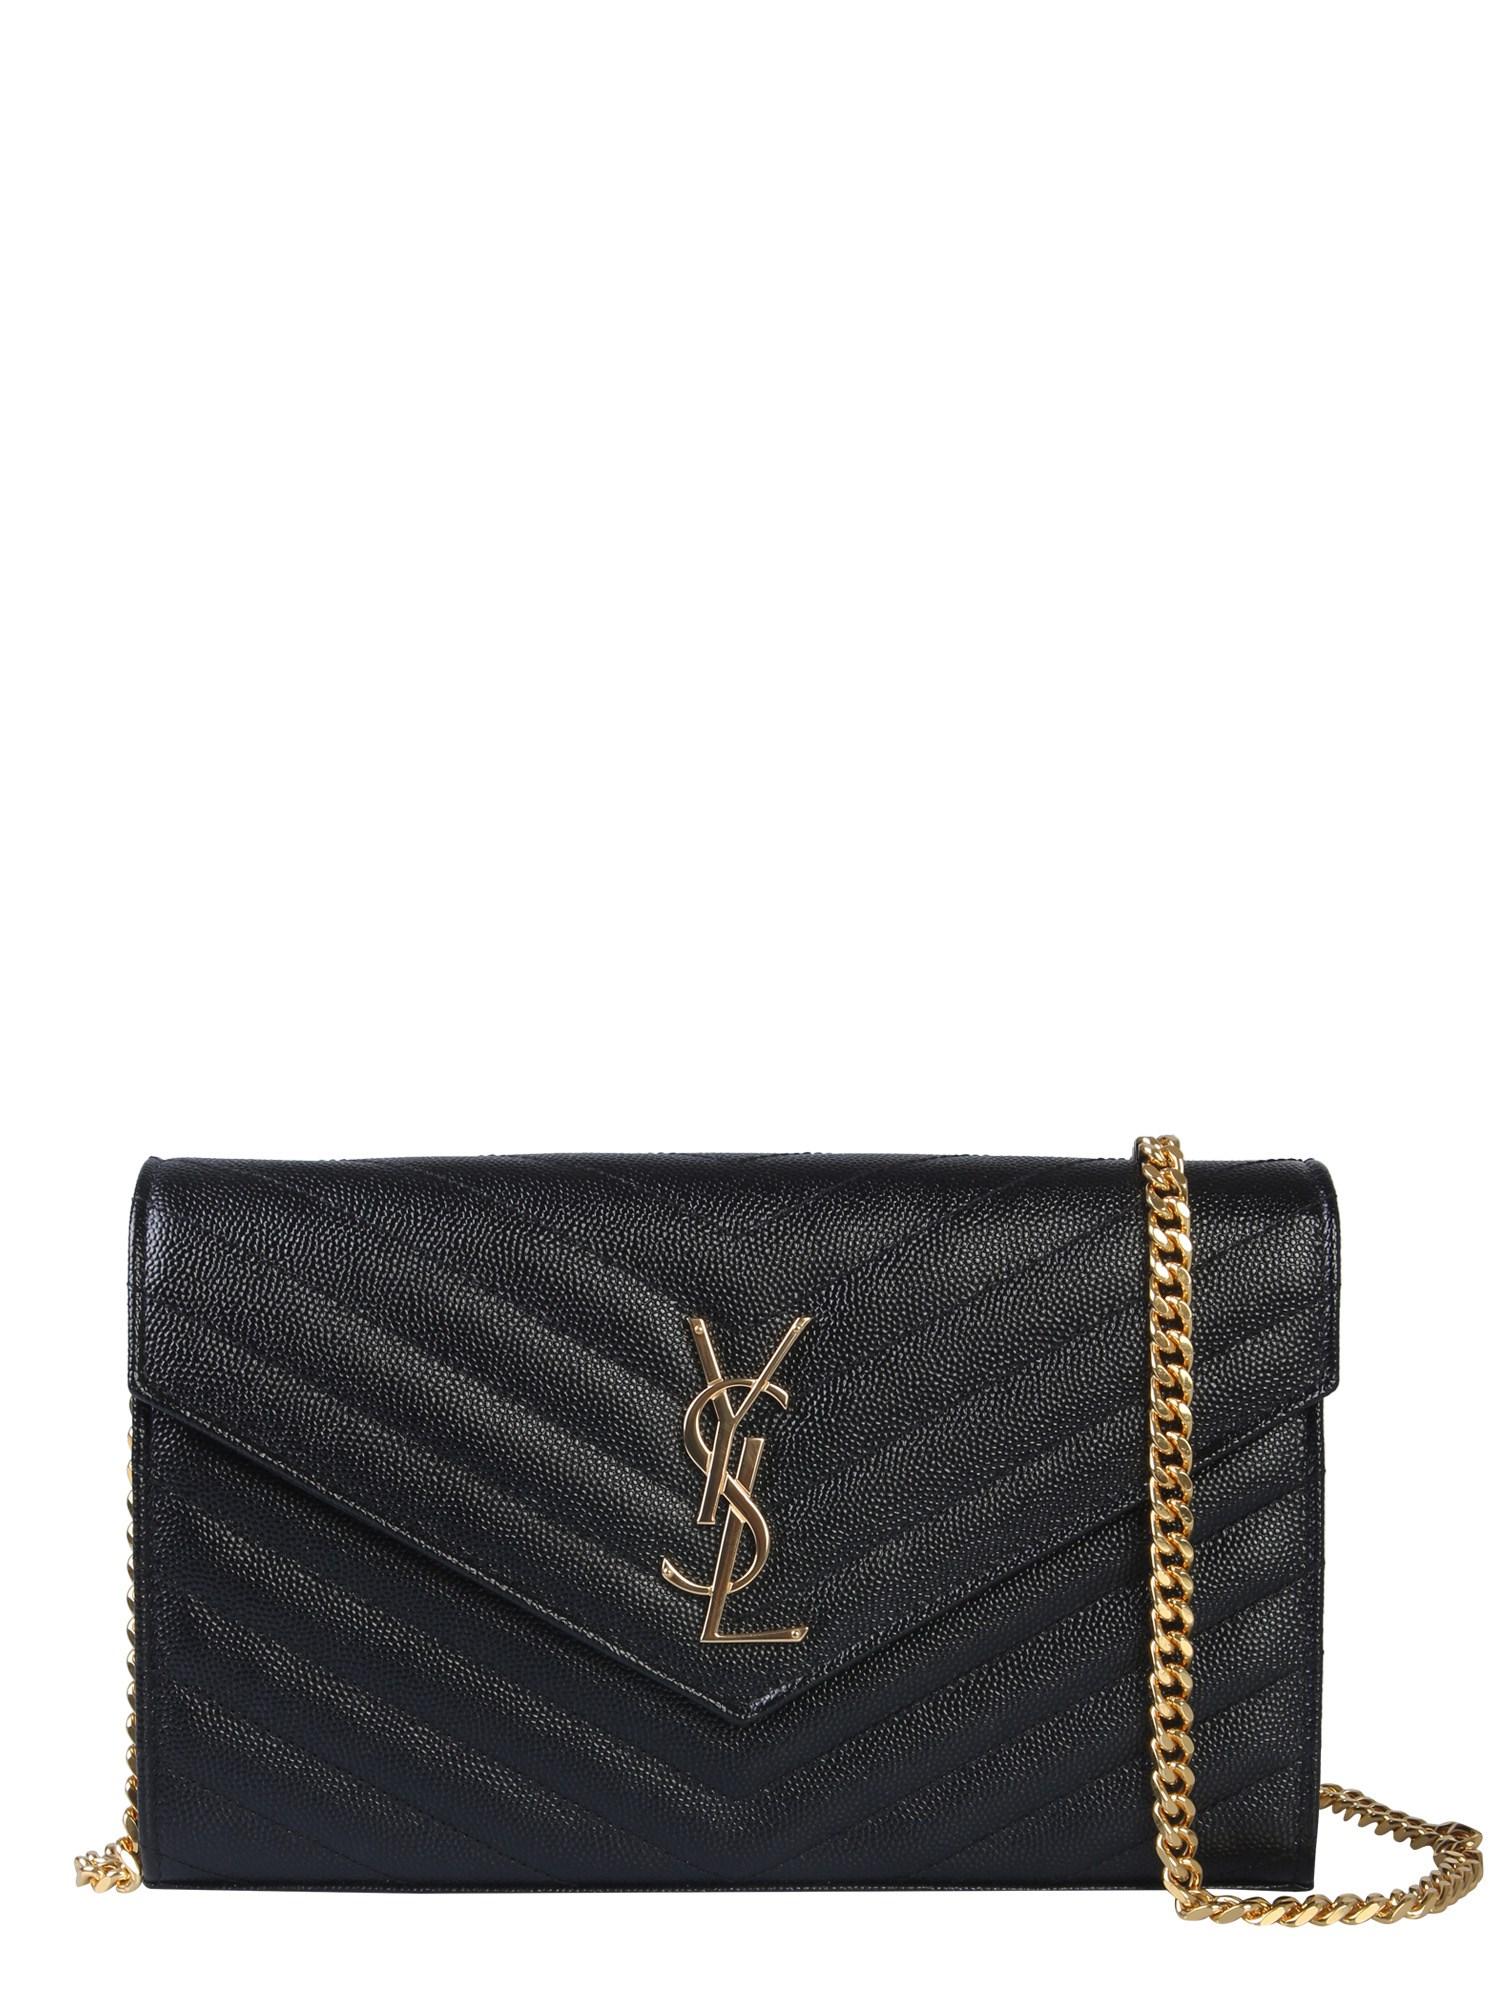 Bolsa monograma de pele Yves Saint Laurent